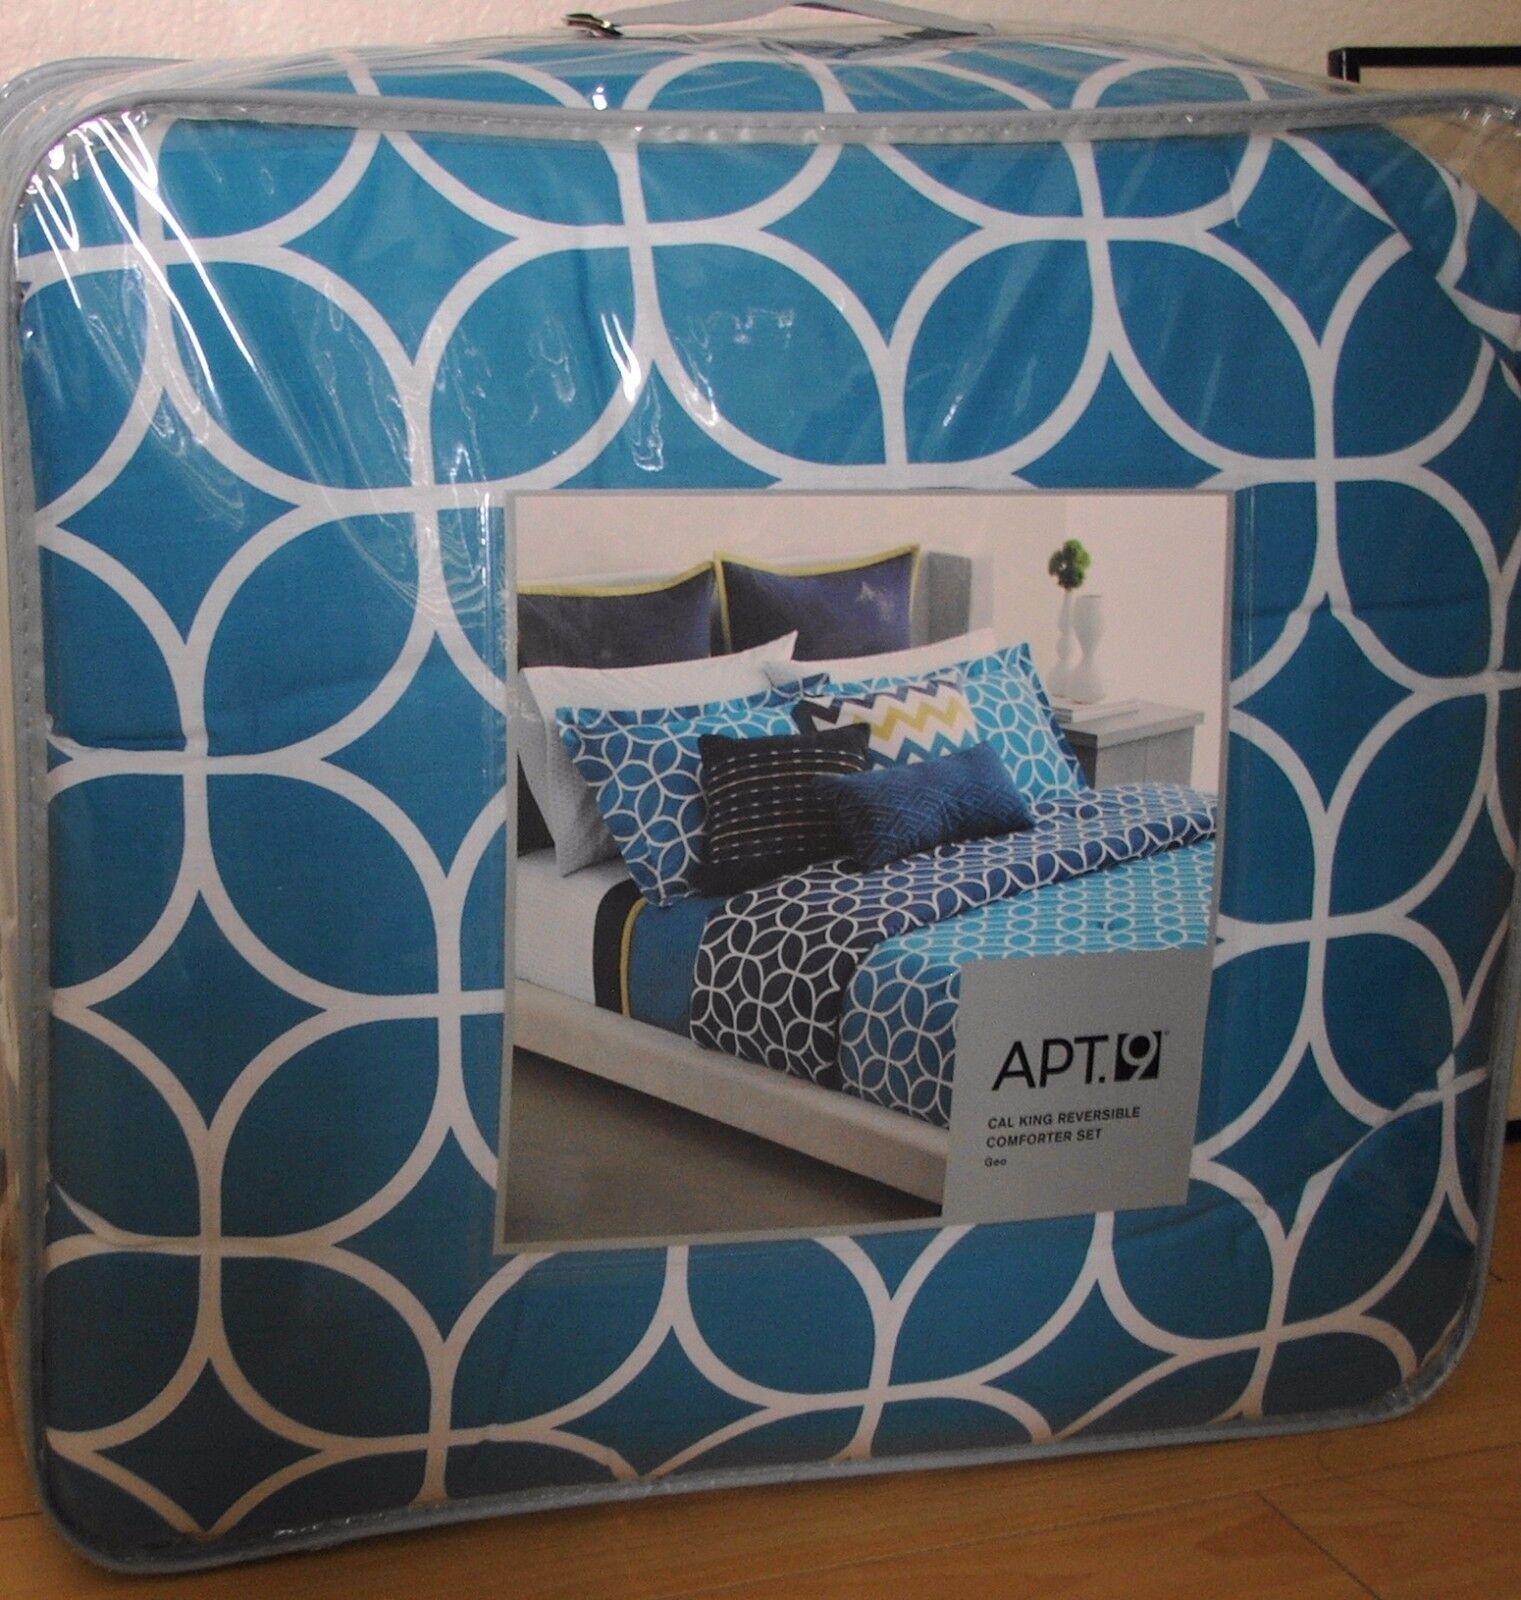 New Apt 9 GEO Reversible  Comforter Set - Gemetric blu bianca Cal King